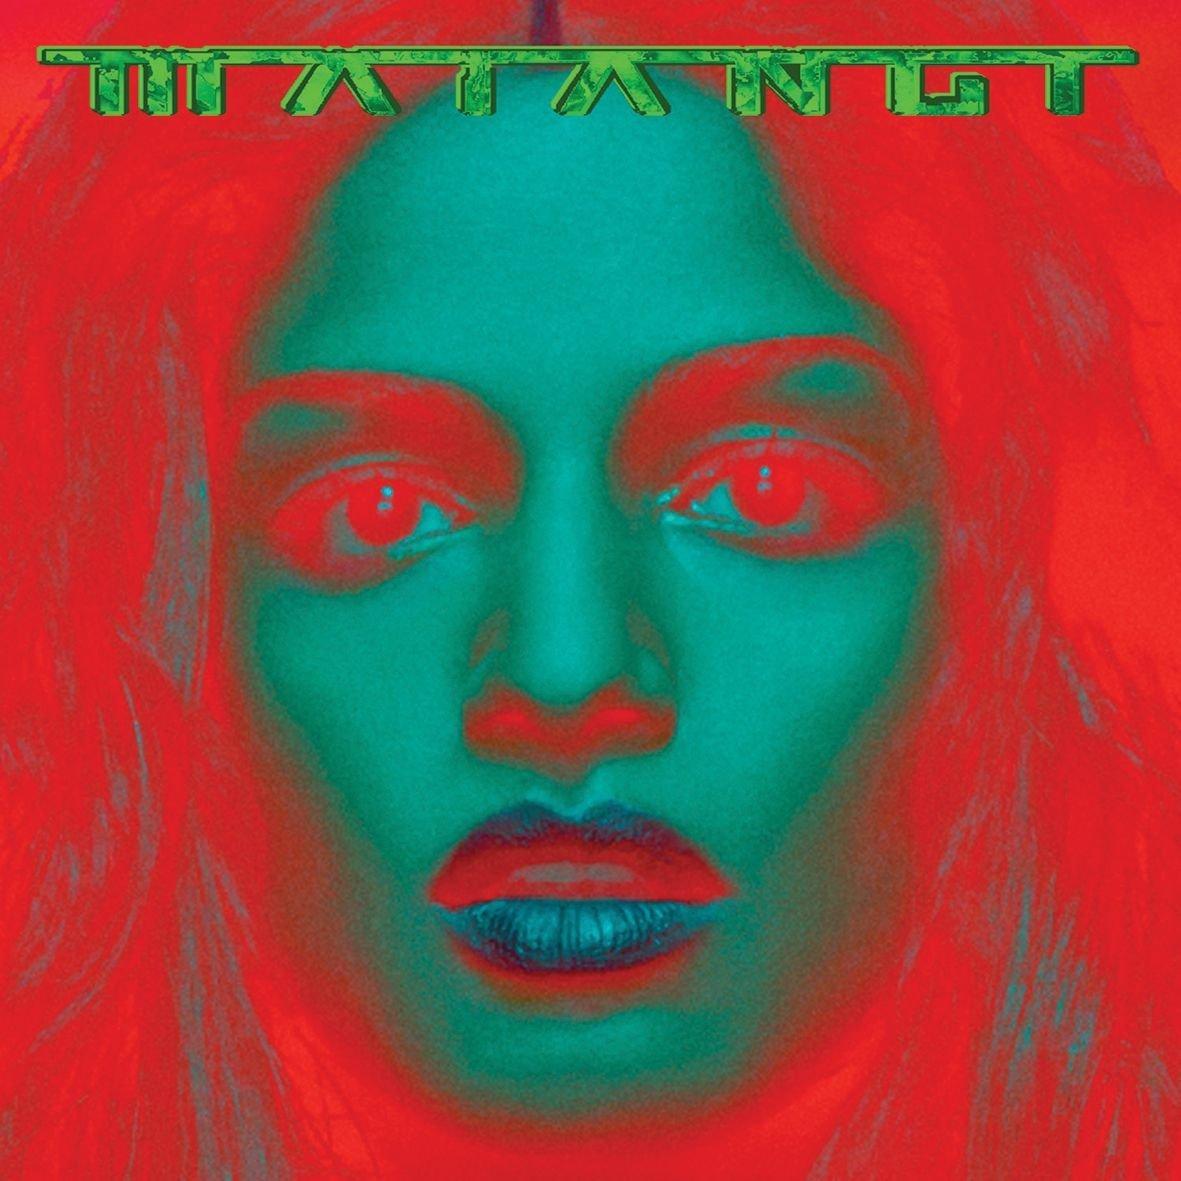 Mia Kala Album Cover M.I.A. – 'Matangi' (...